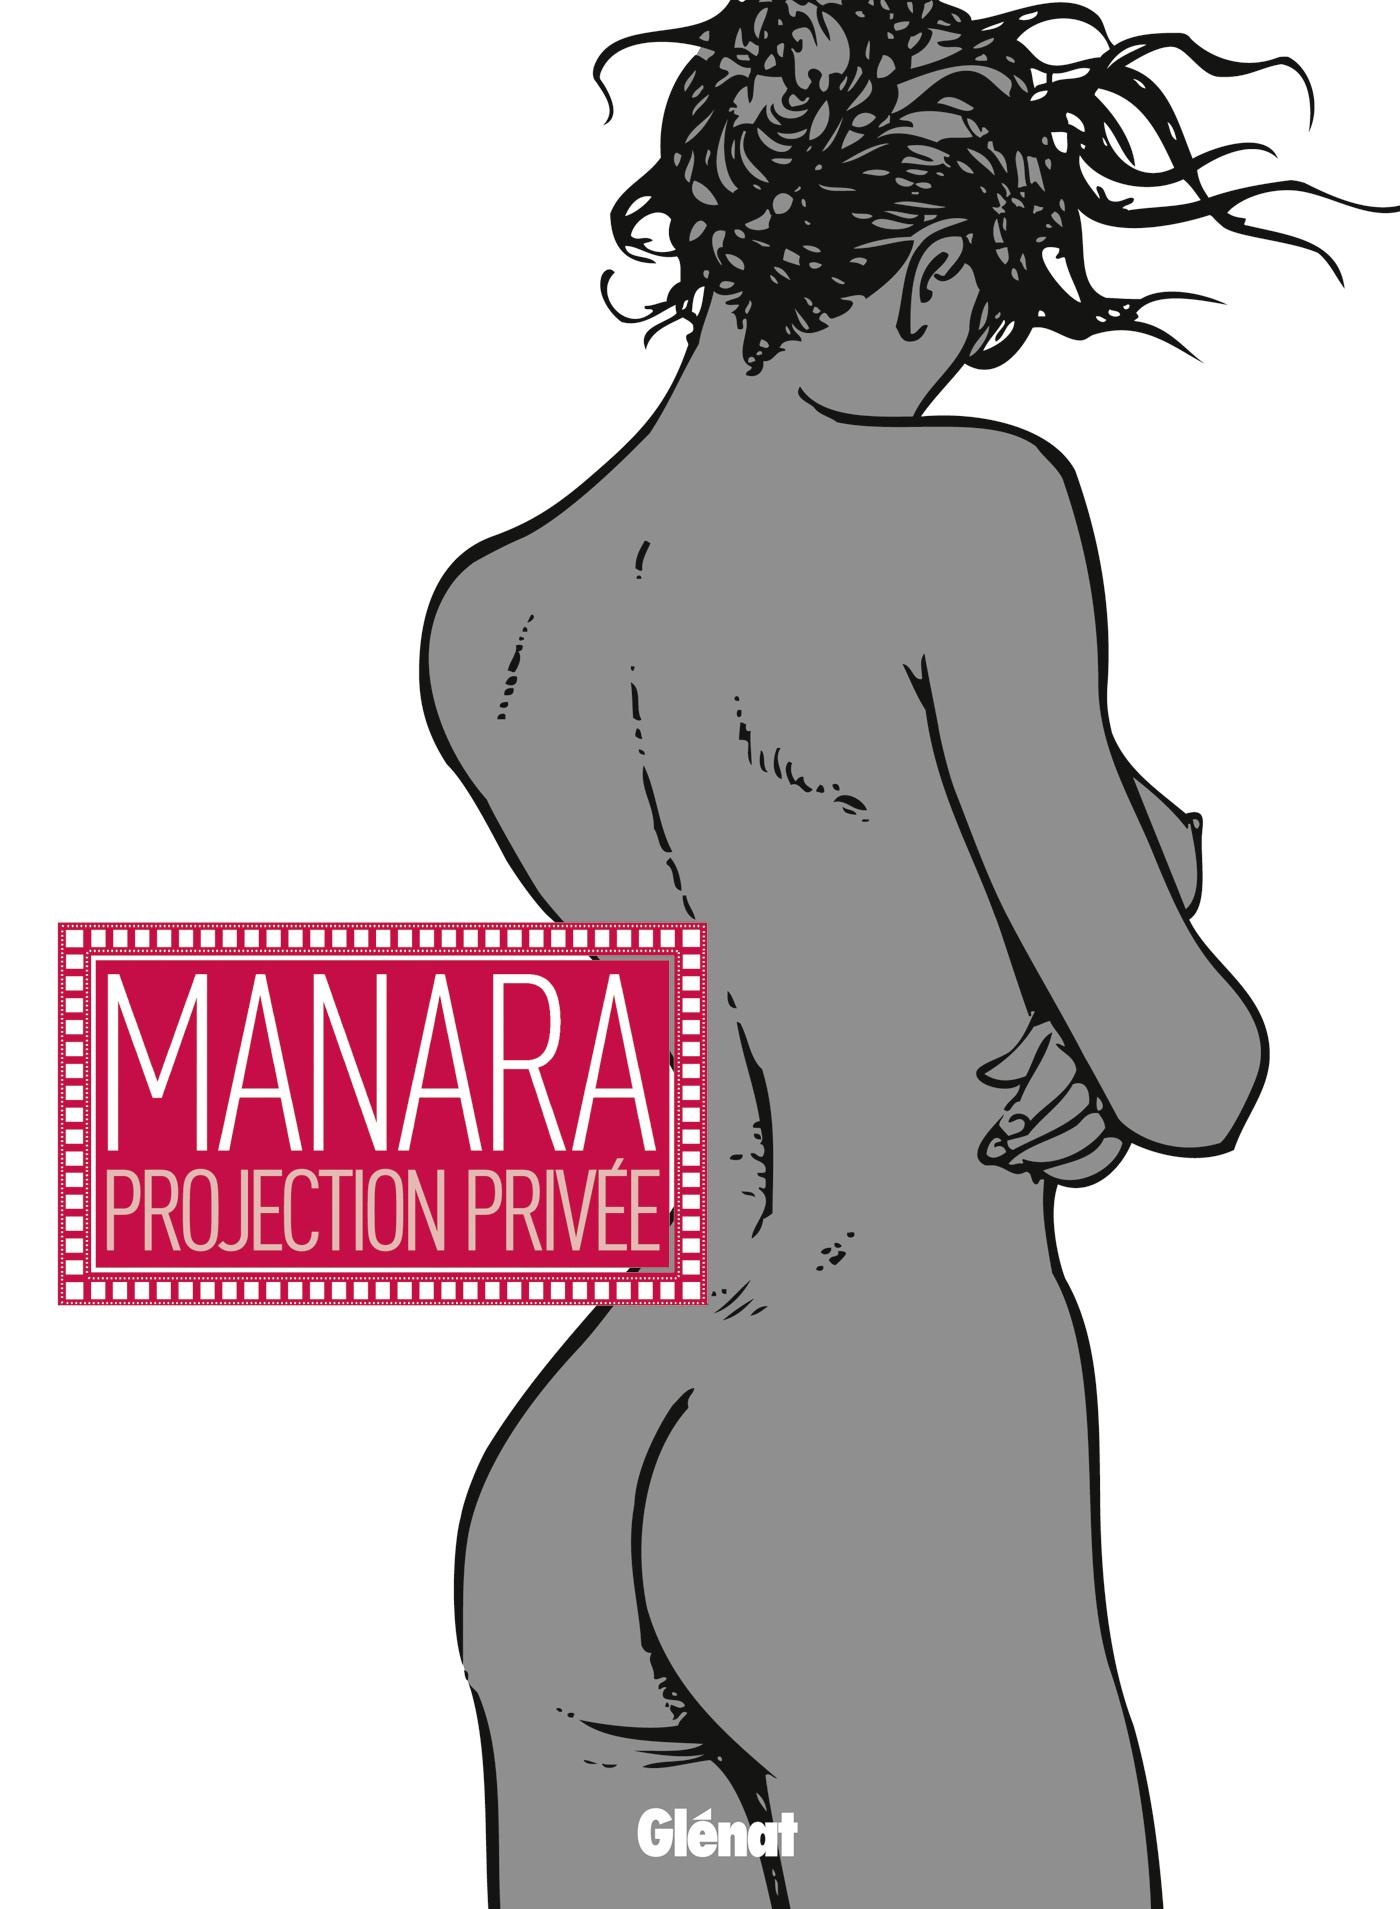 Manara Projection Privee Couv